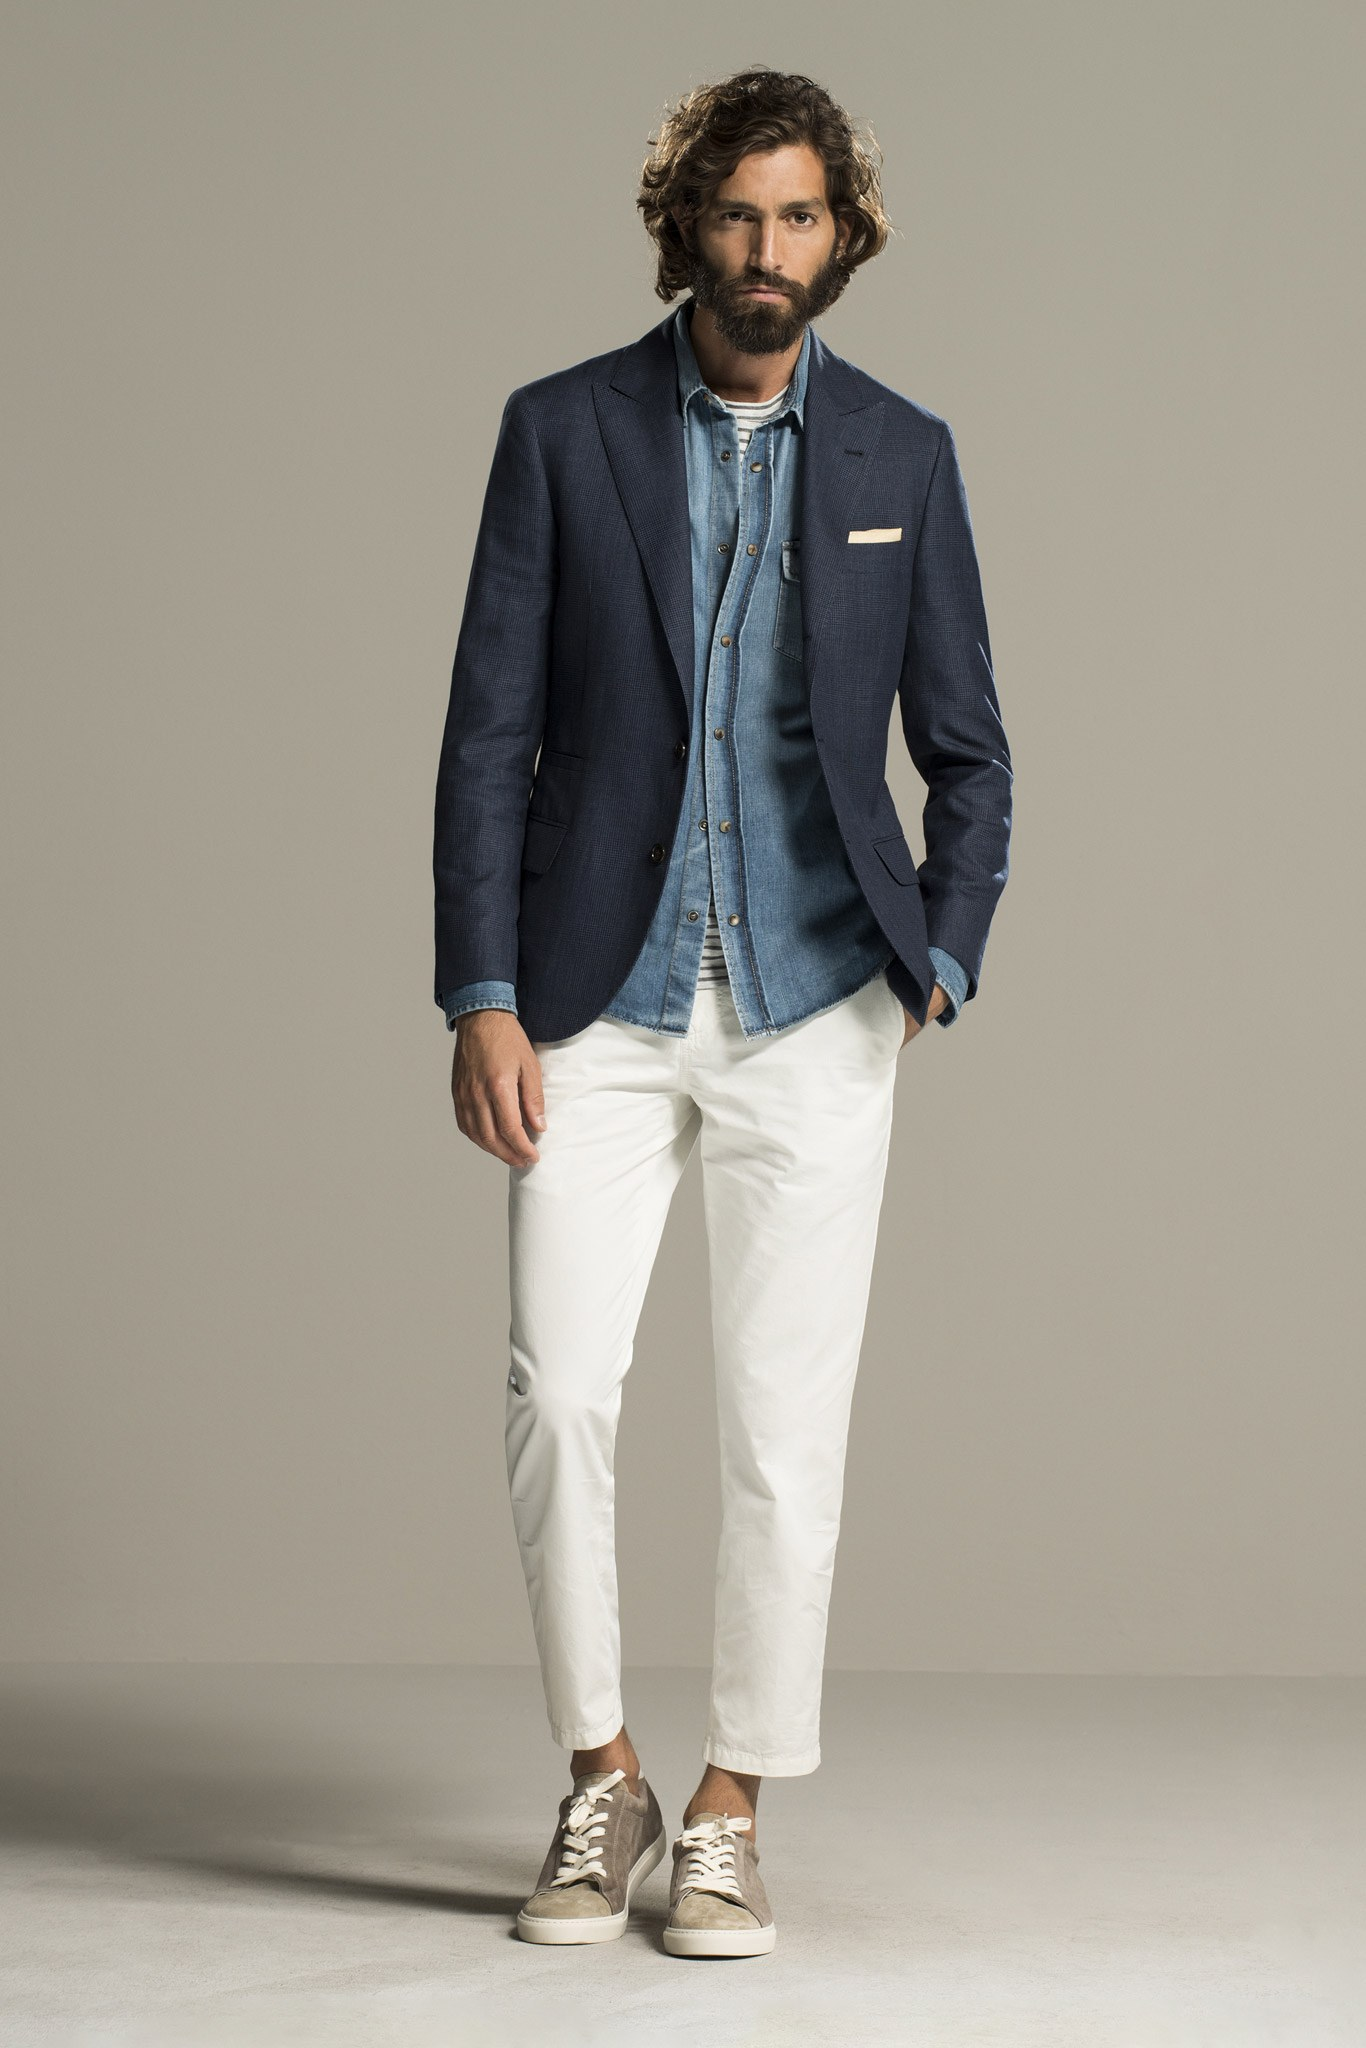 Spring Menswear Style Inspiration - Spring 2016 Menswear Brunello Cucinelli Look 26 | Vogue